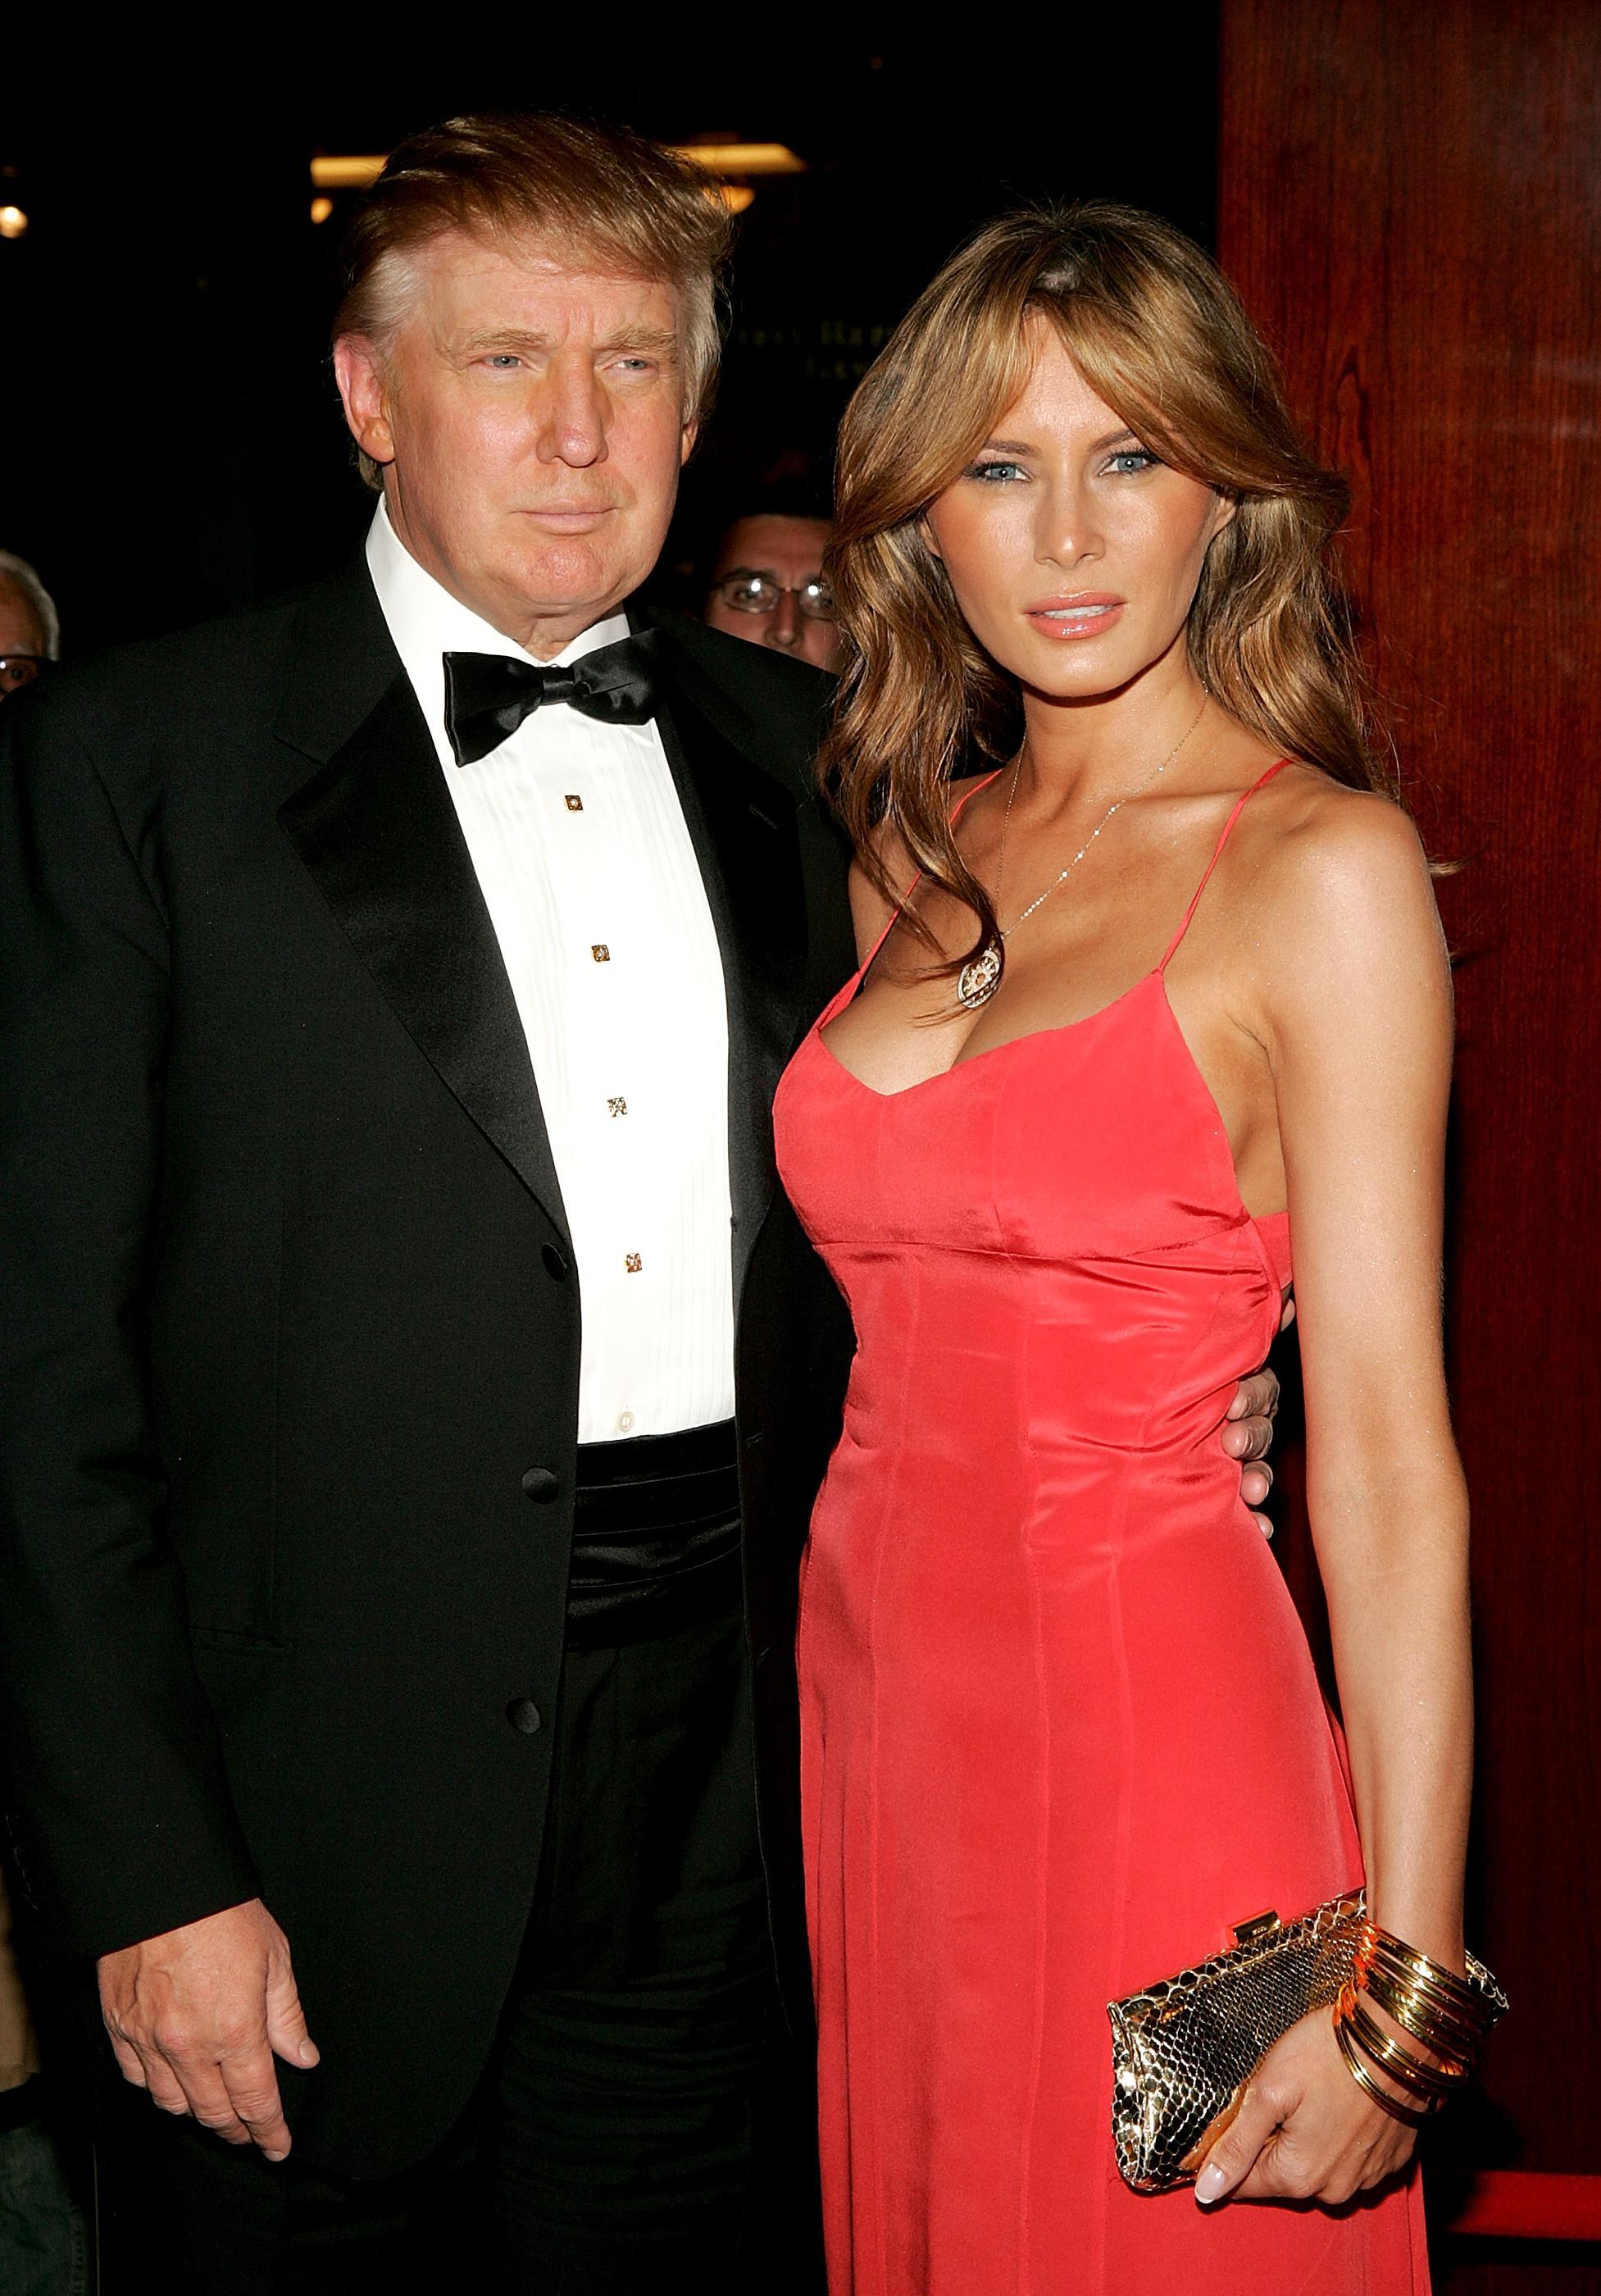 Melania Knauss photo 1 of 395 pics, wallpaper - photo ... Ivanka Trump